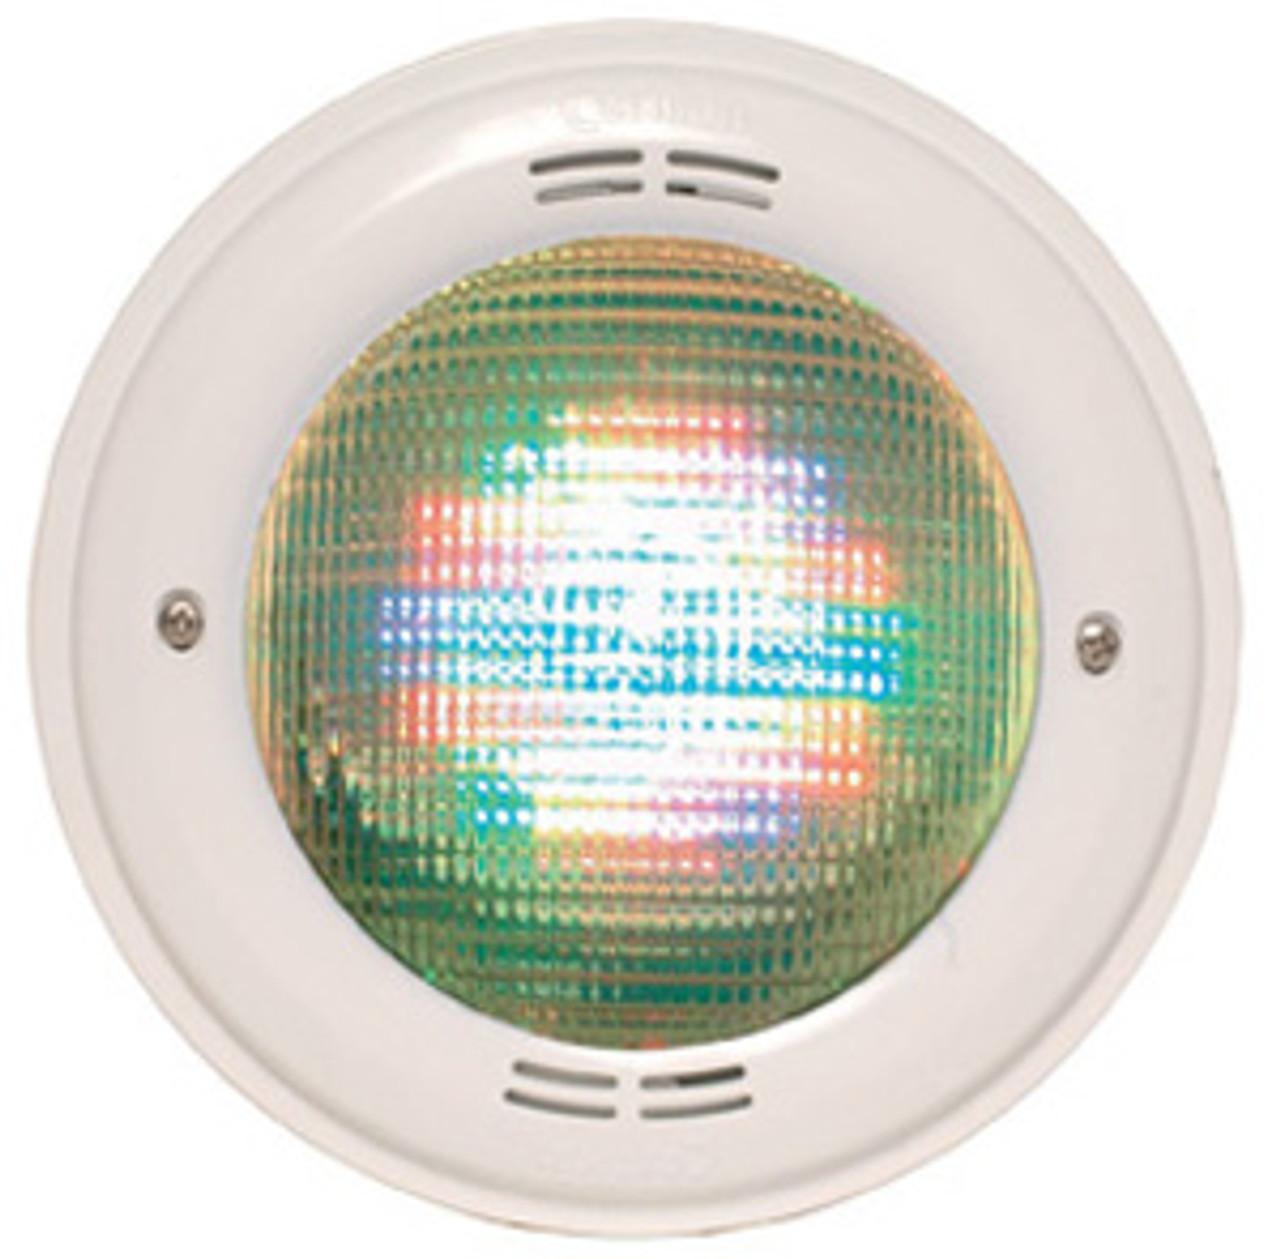 Certikin PU6 LT Colour Changing LED Underwater Swimming Pool Light